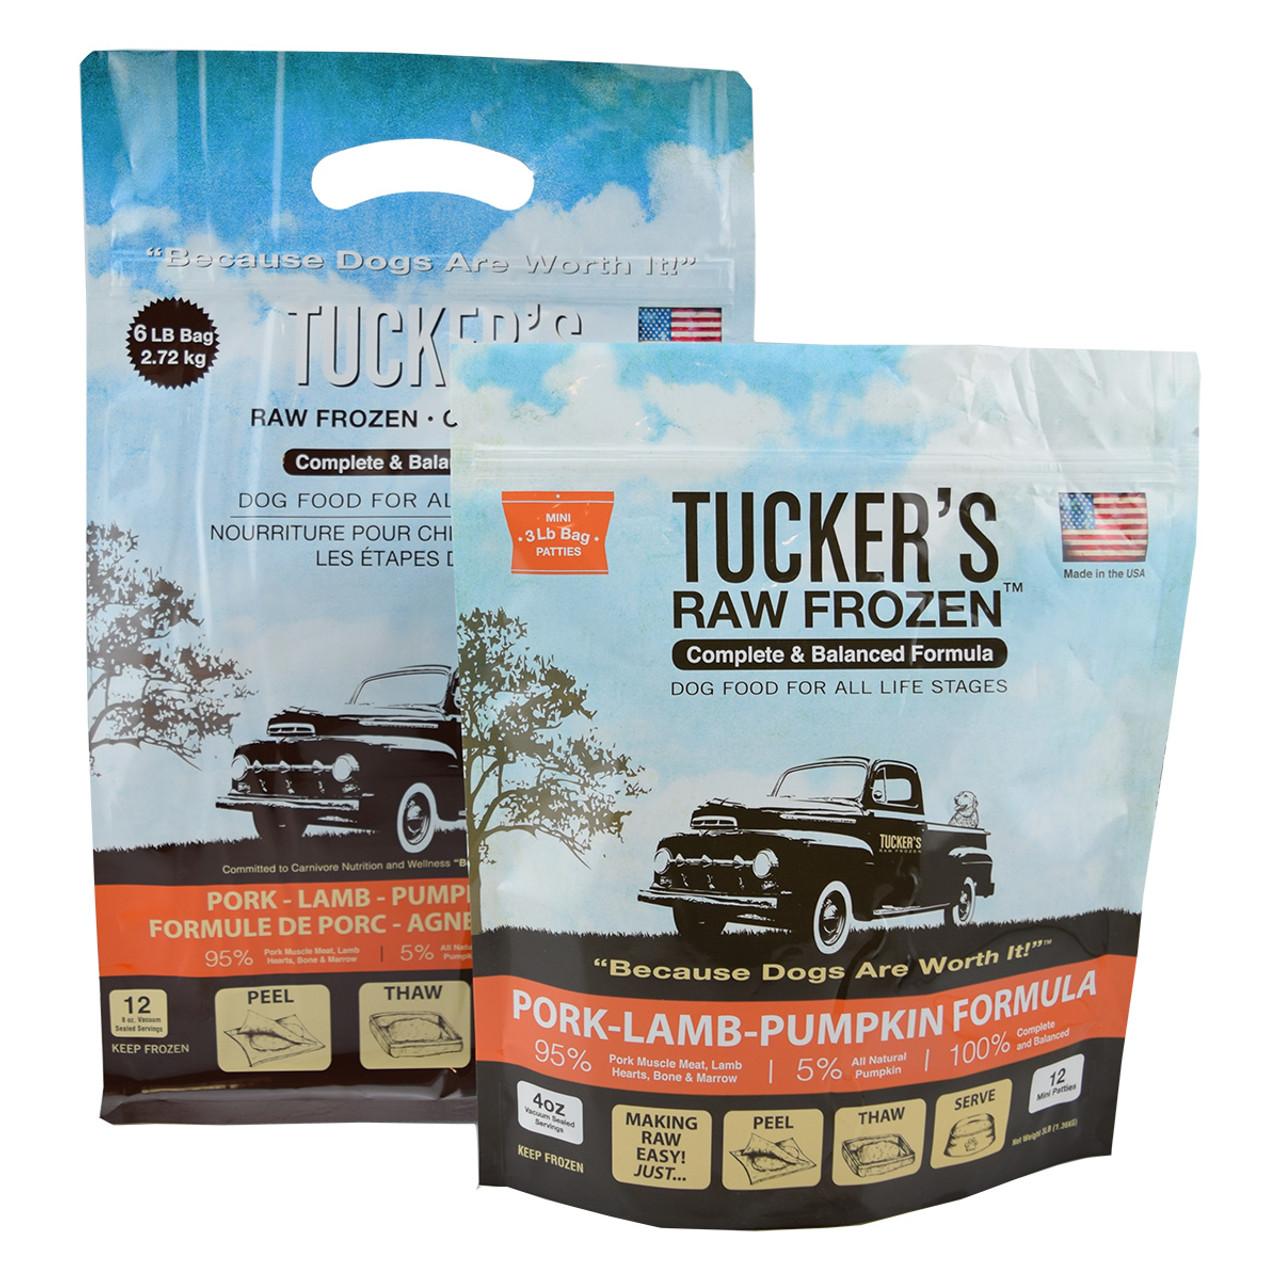 Tucker's Raw Frozen Pork-Lamb-Pumpkin Dog Food